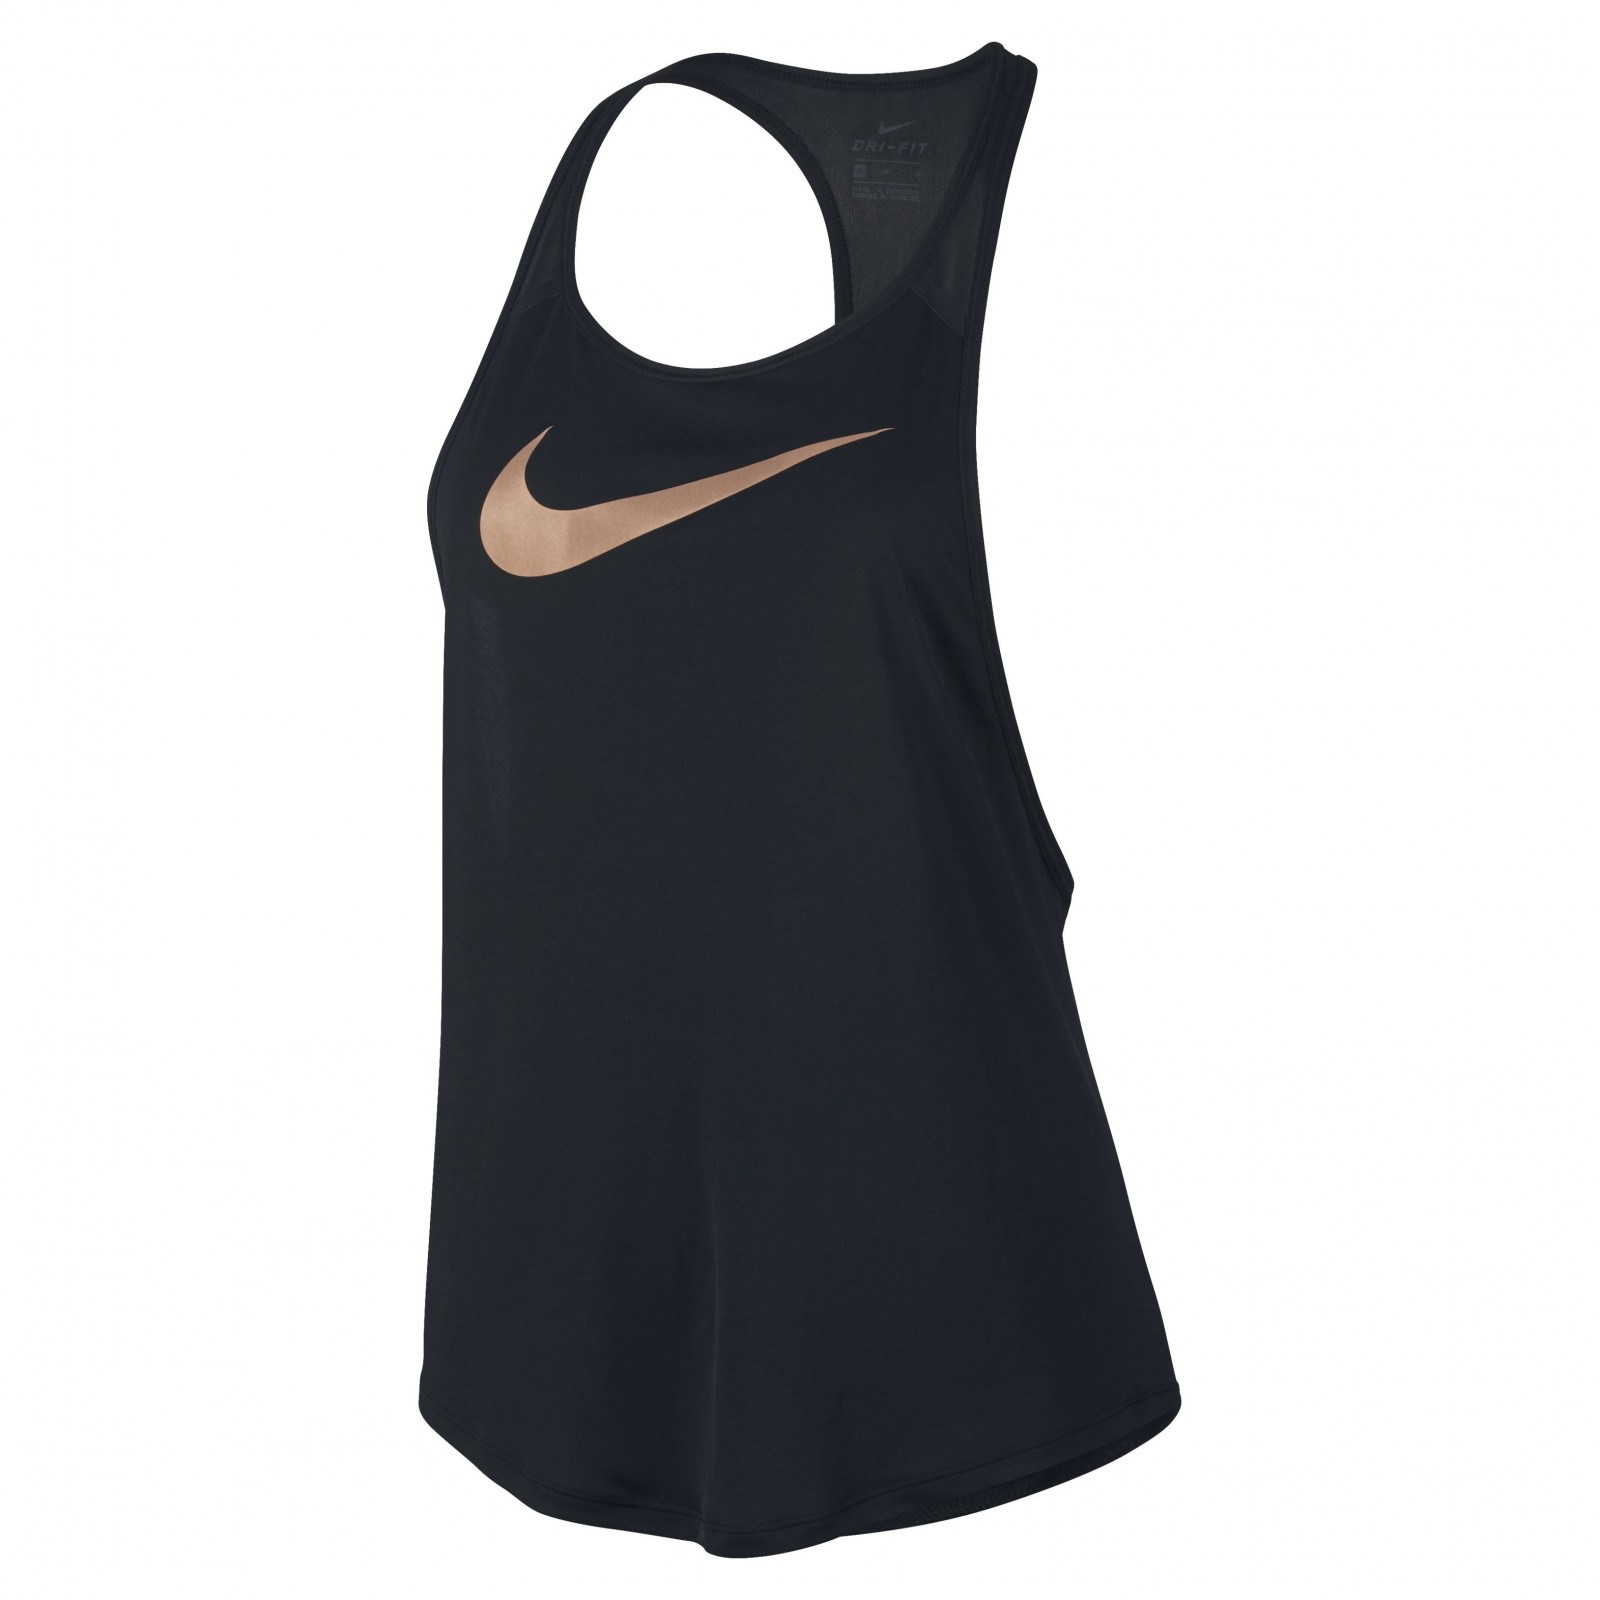 3e8c3e14108 Dámské tílko Nike W TANK FLOW METALLIC